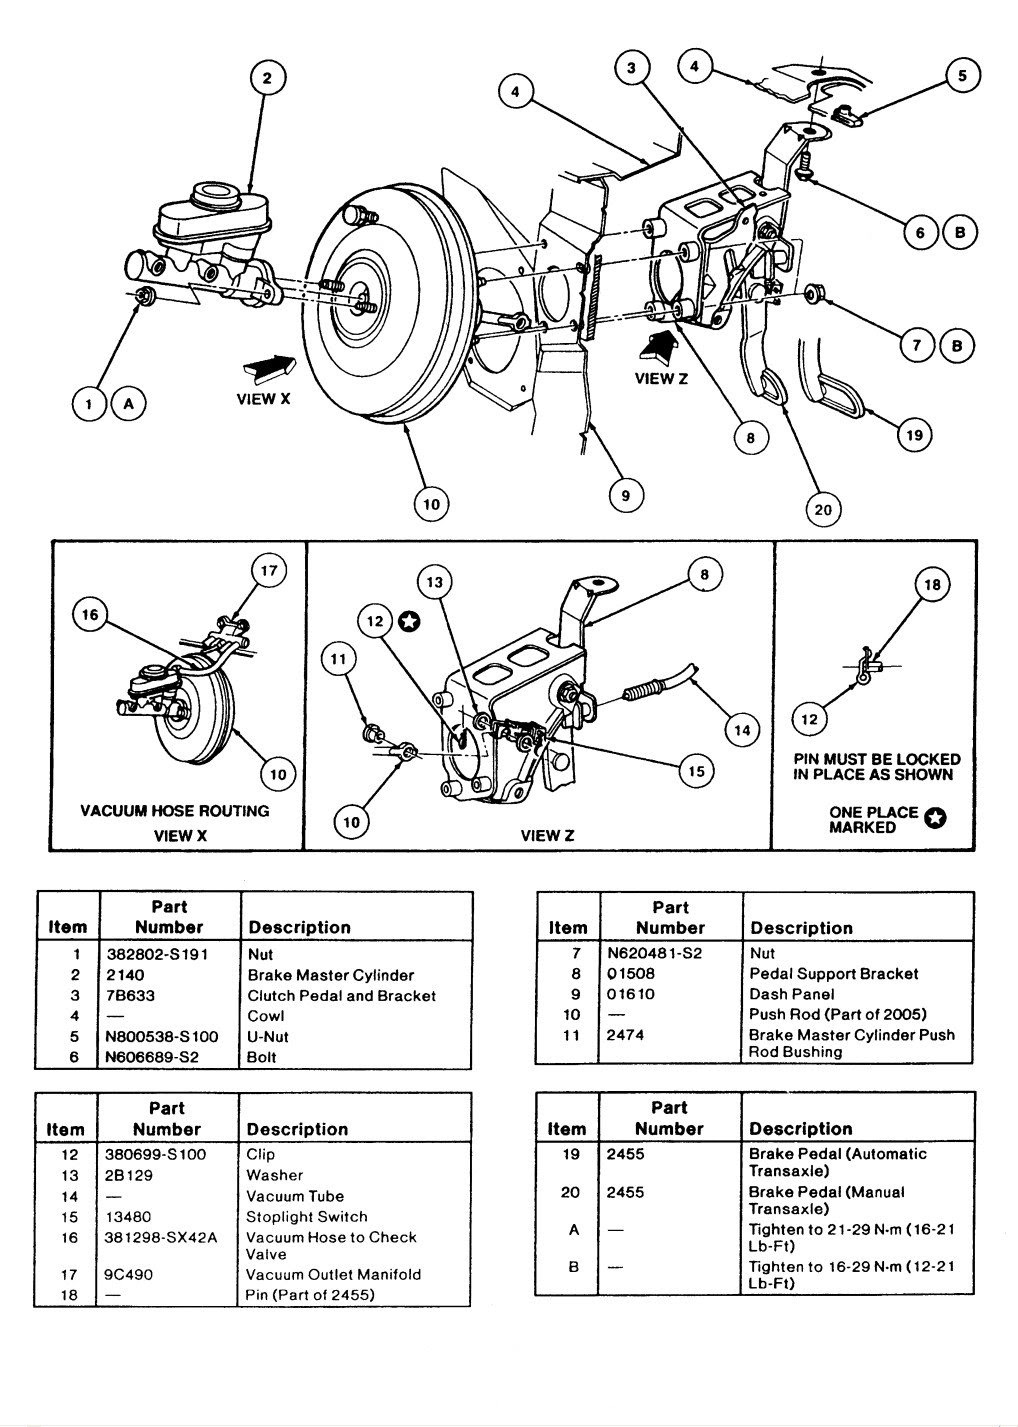 Brake System And Vacum Leak Taurus Car Club Of America Ford Taurus Forum